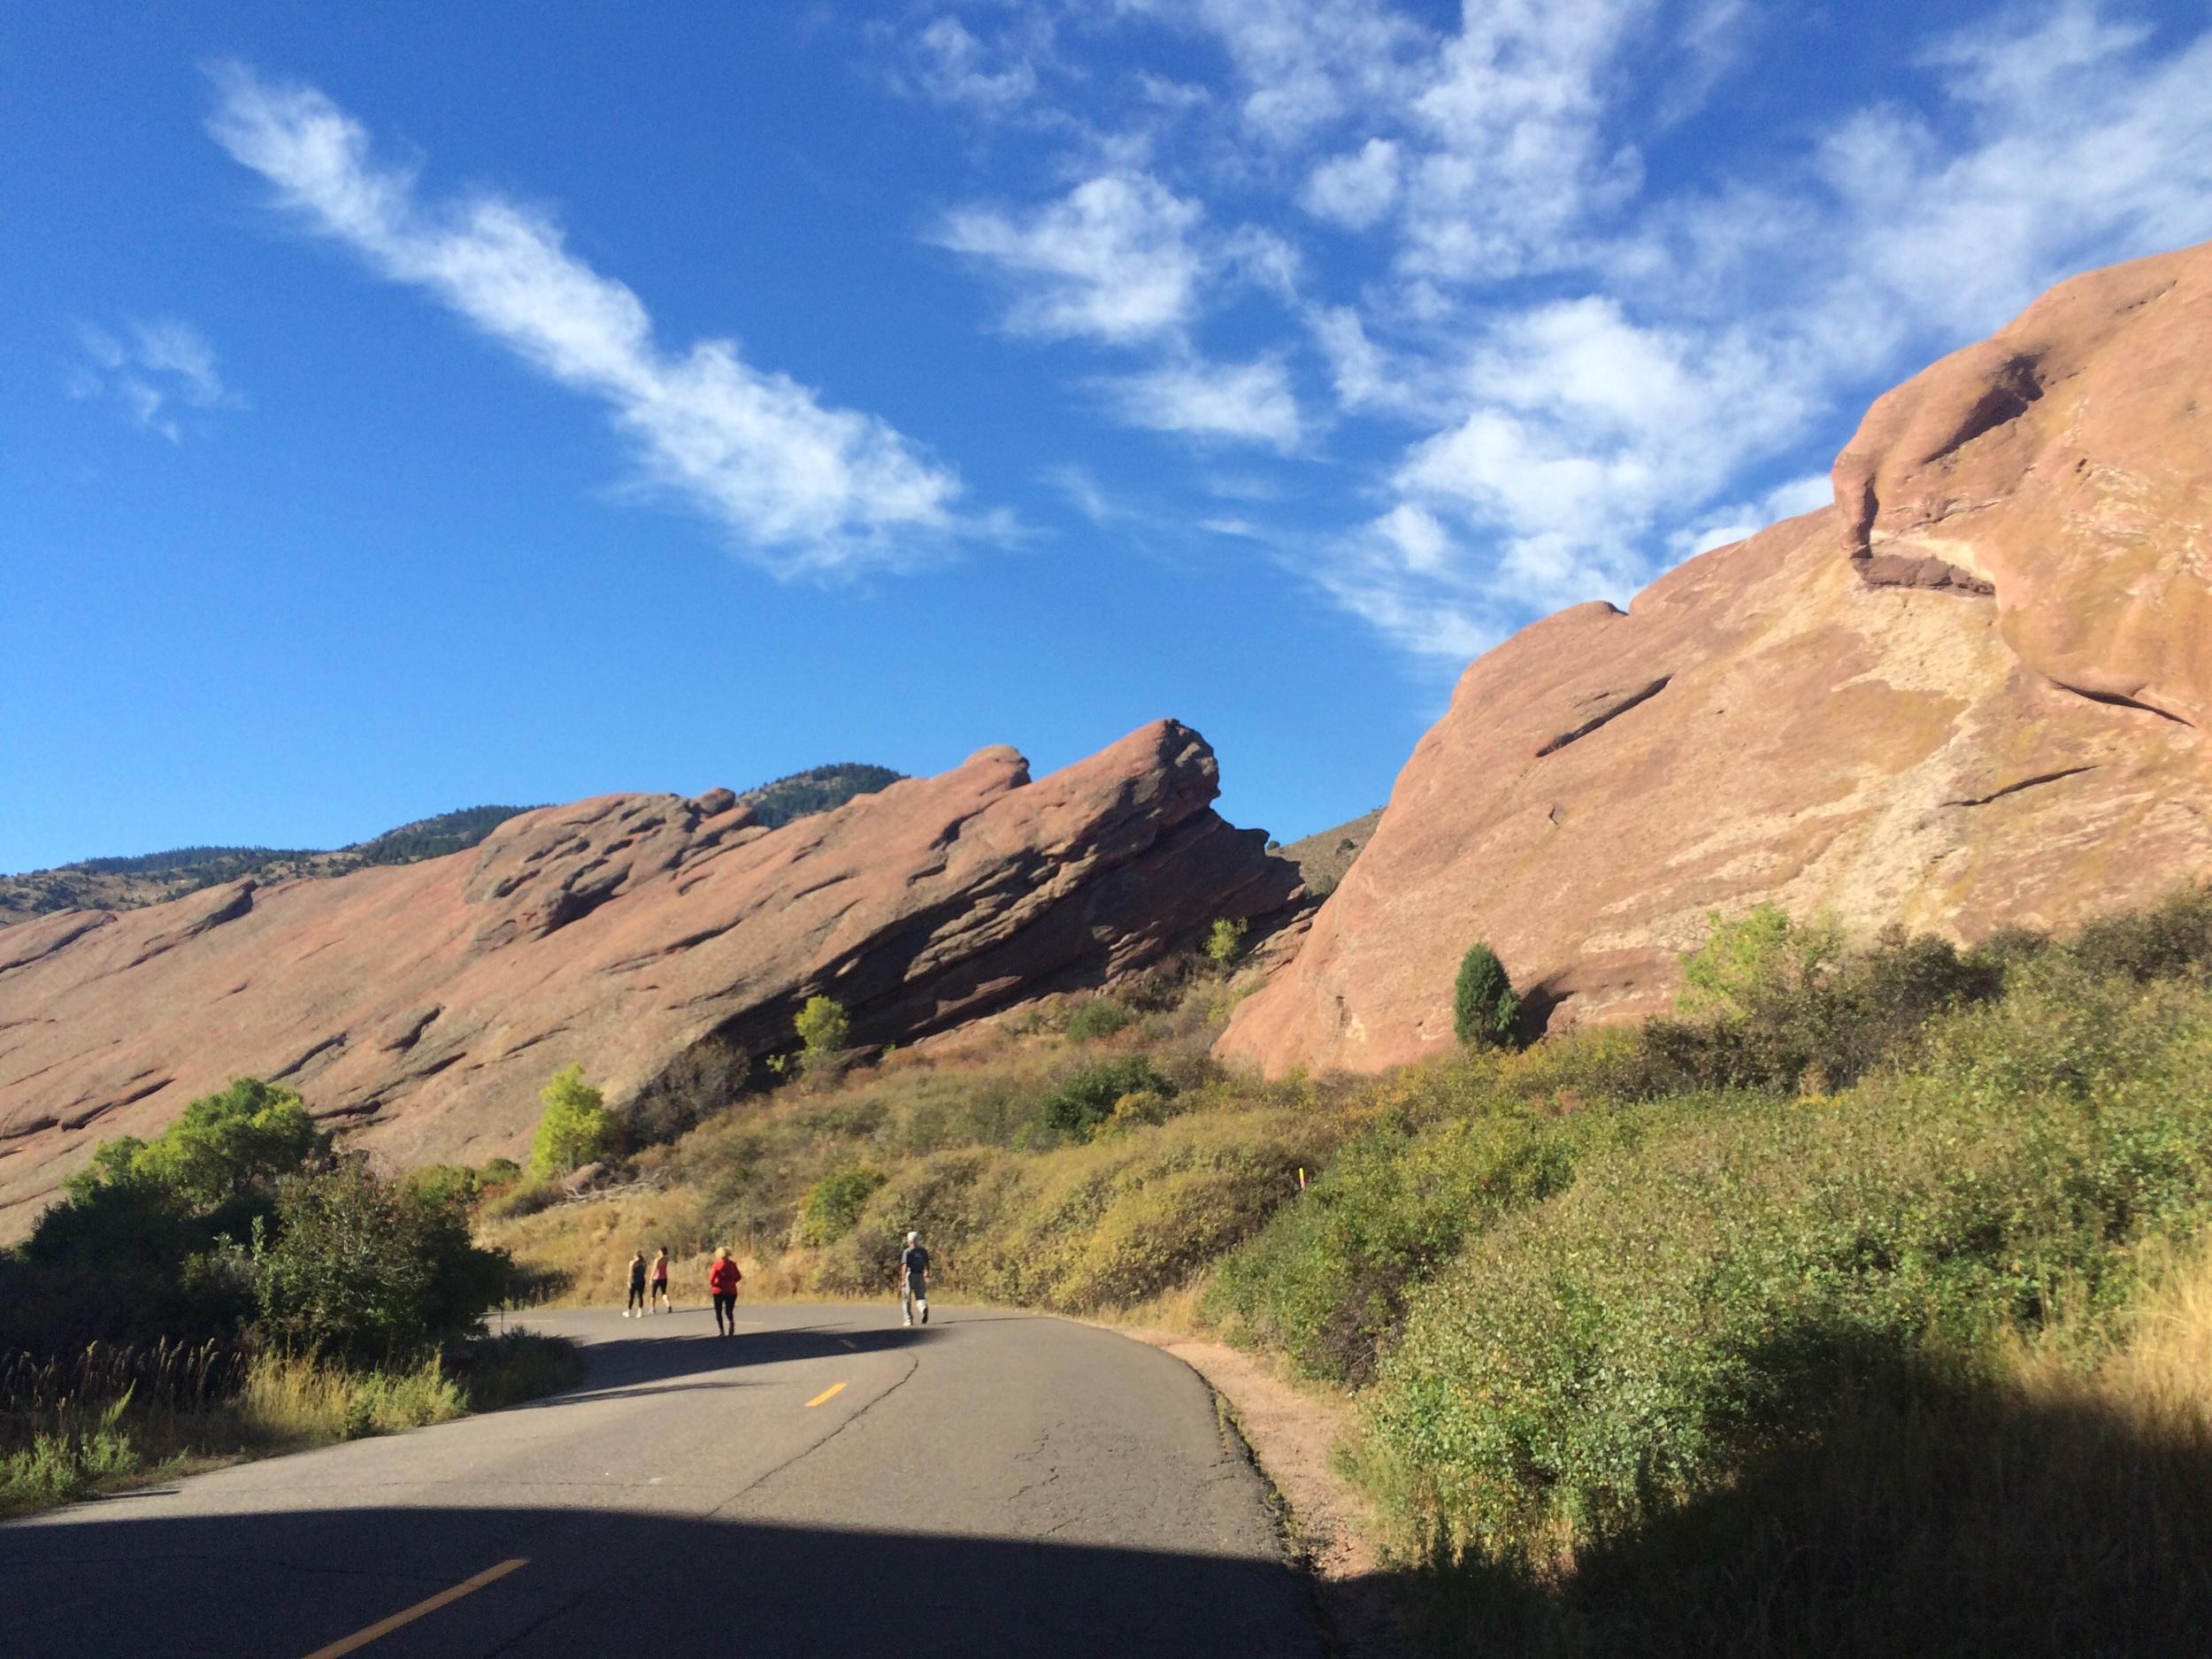 Run the Rocks - a 5k through Red Rocks Amphitheater - aka the hardest 5k ever